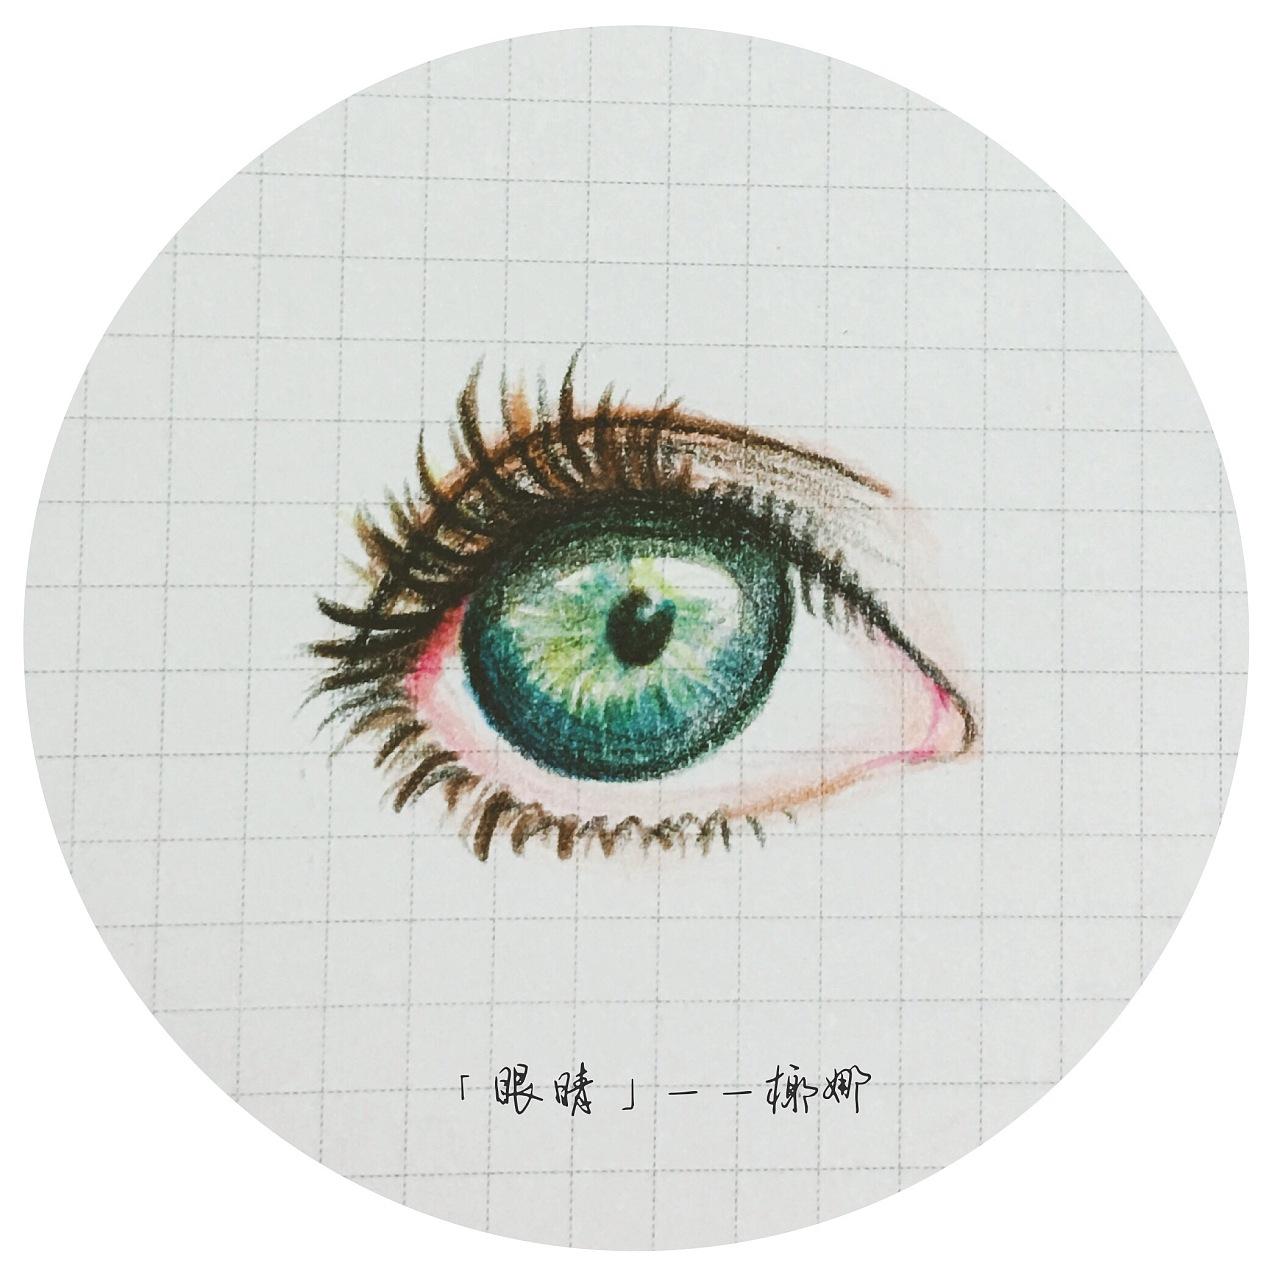 眼睛 | 彩铅手绘原创